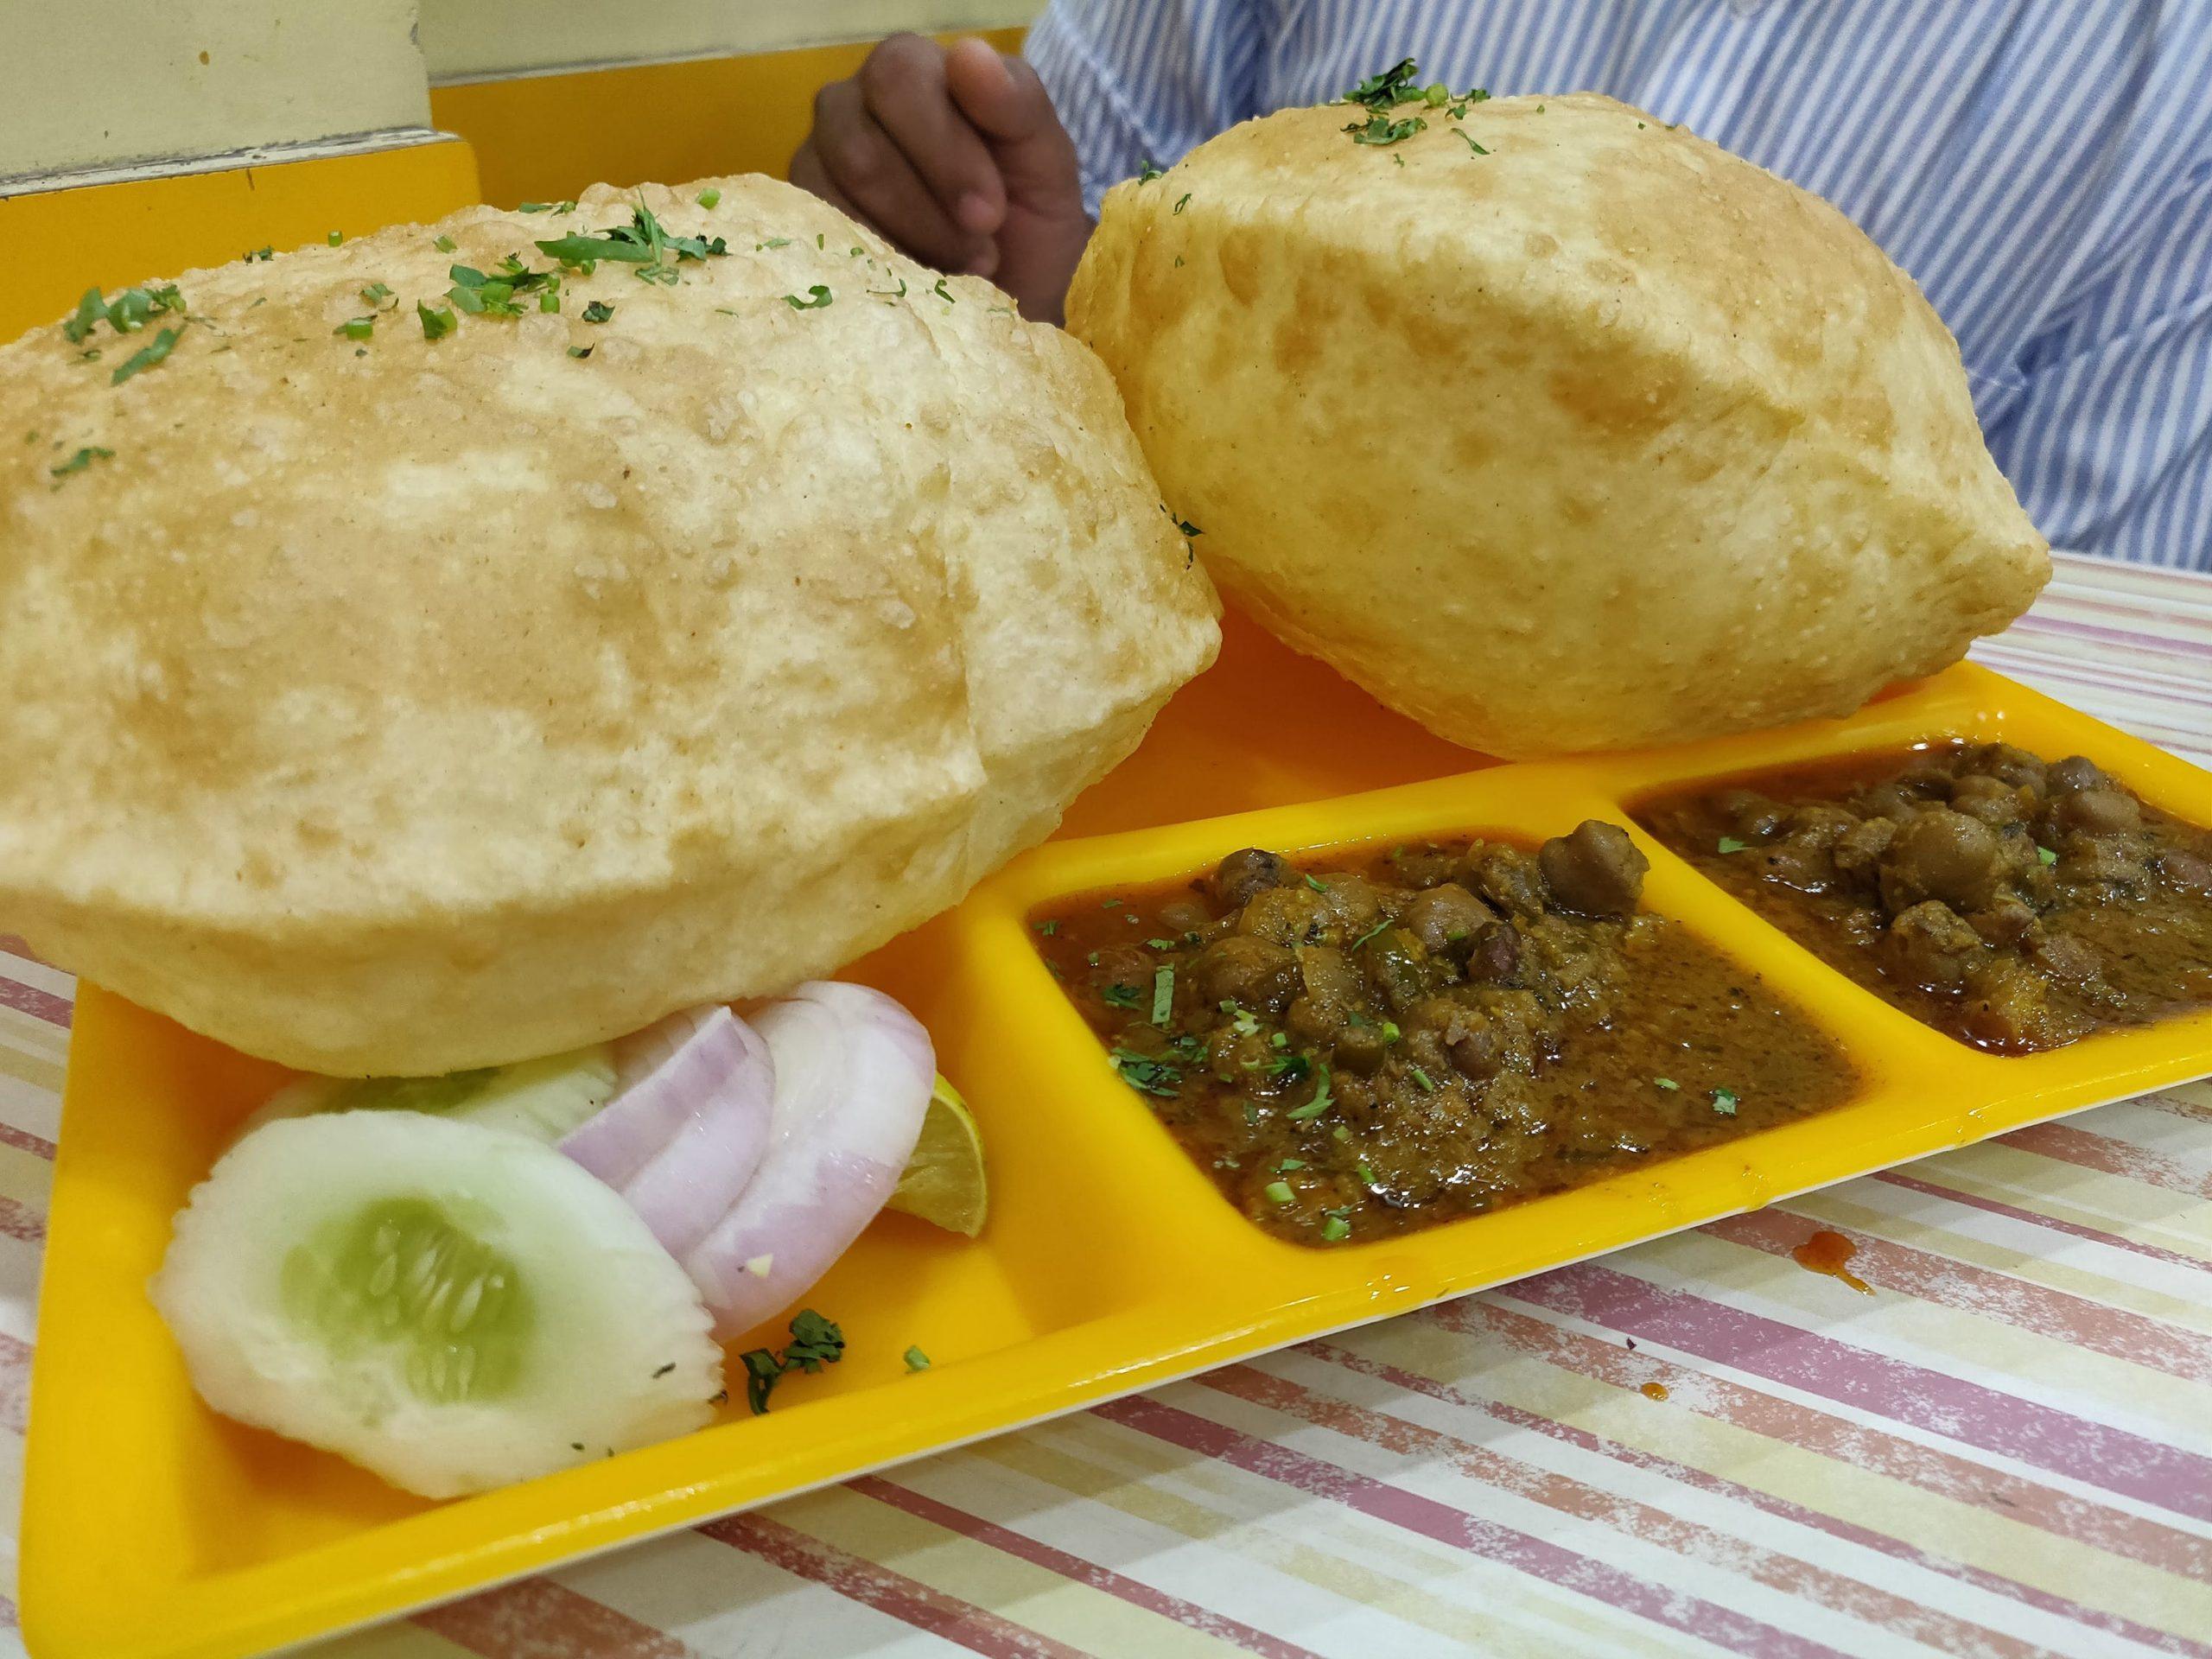 Food Truck Park Tasty Chhole Bhature Street Food in Ahmedabad, Gujarat